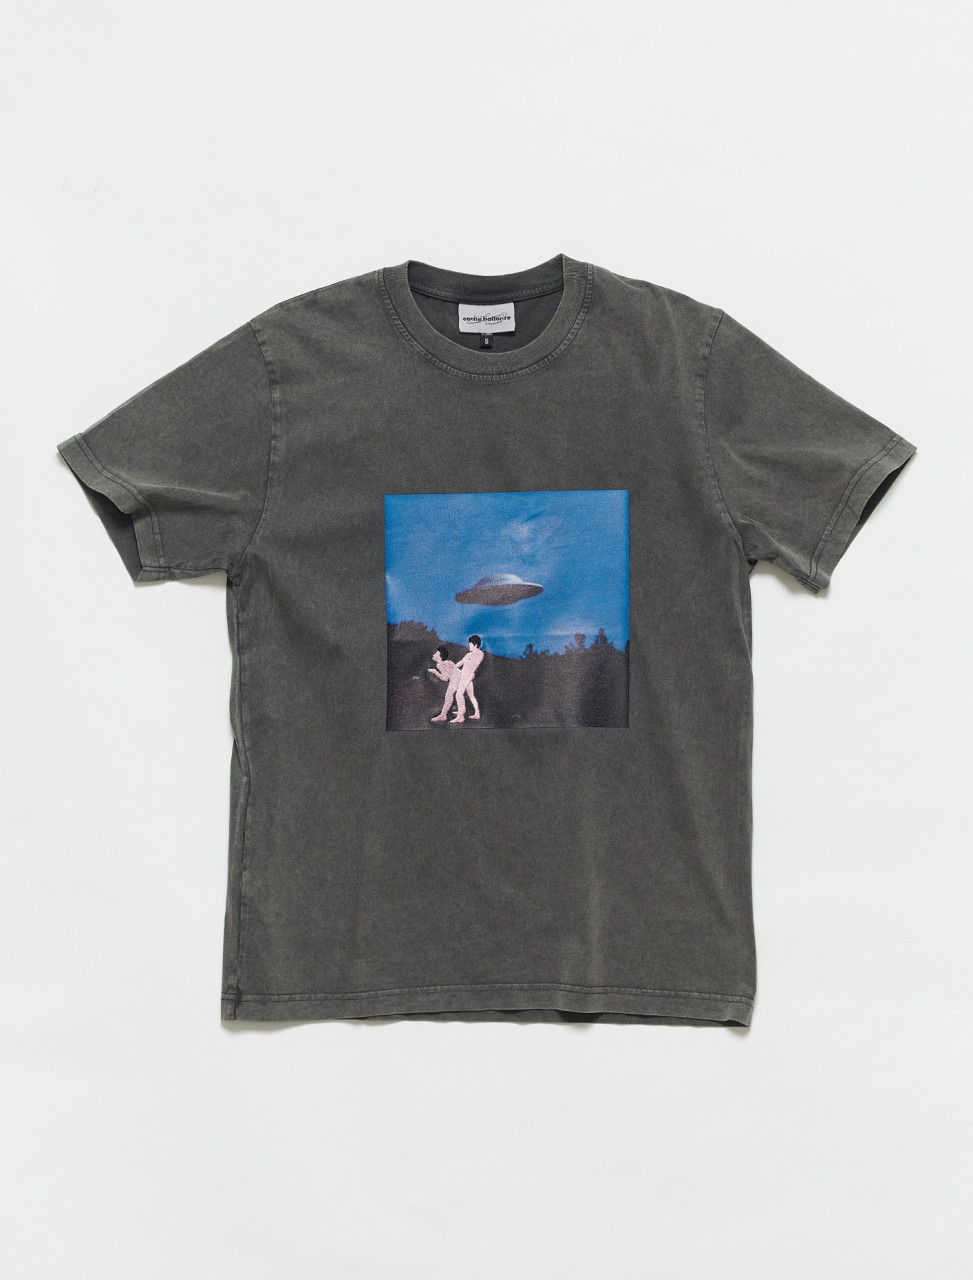 PRESS21TS09 CARNE BOLLENTE Abuduction Seduction T Shirt